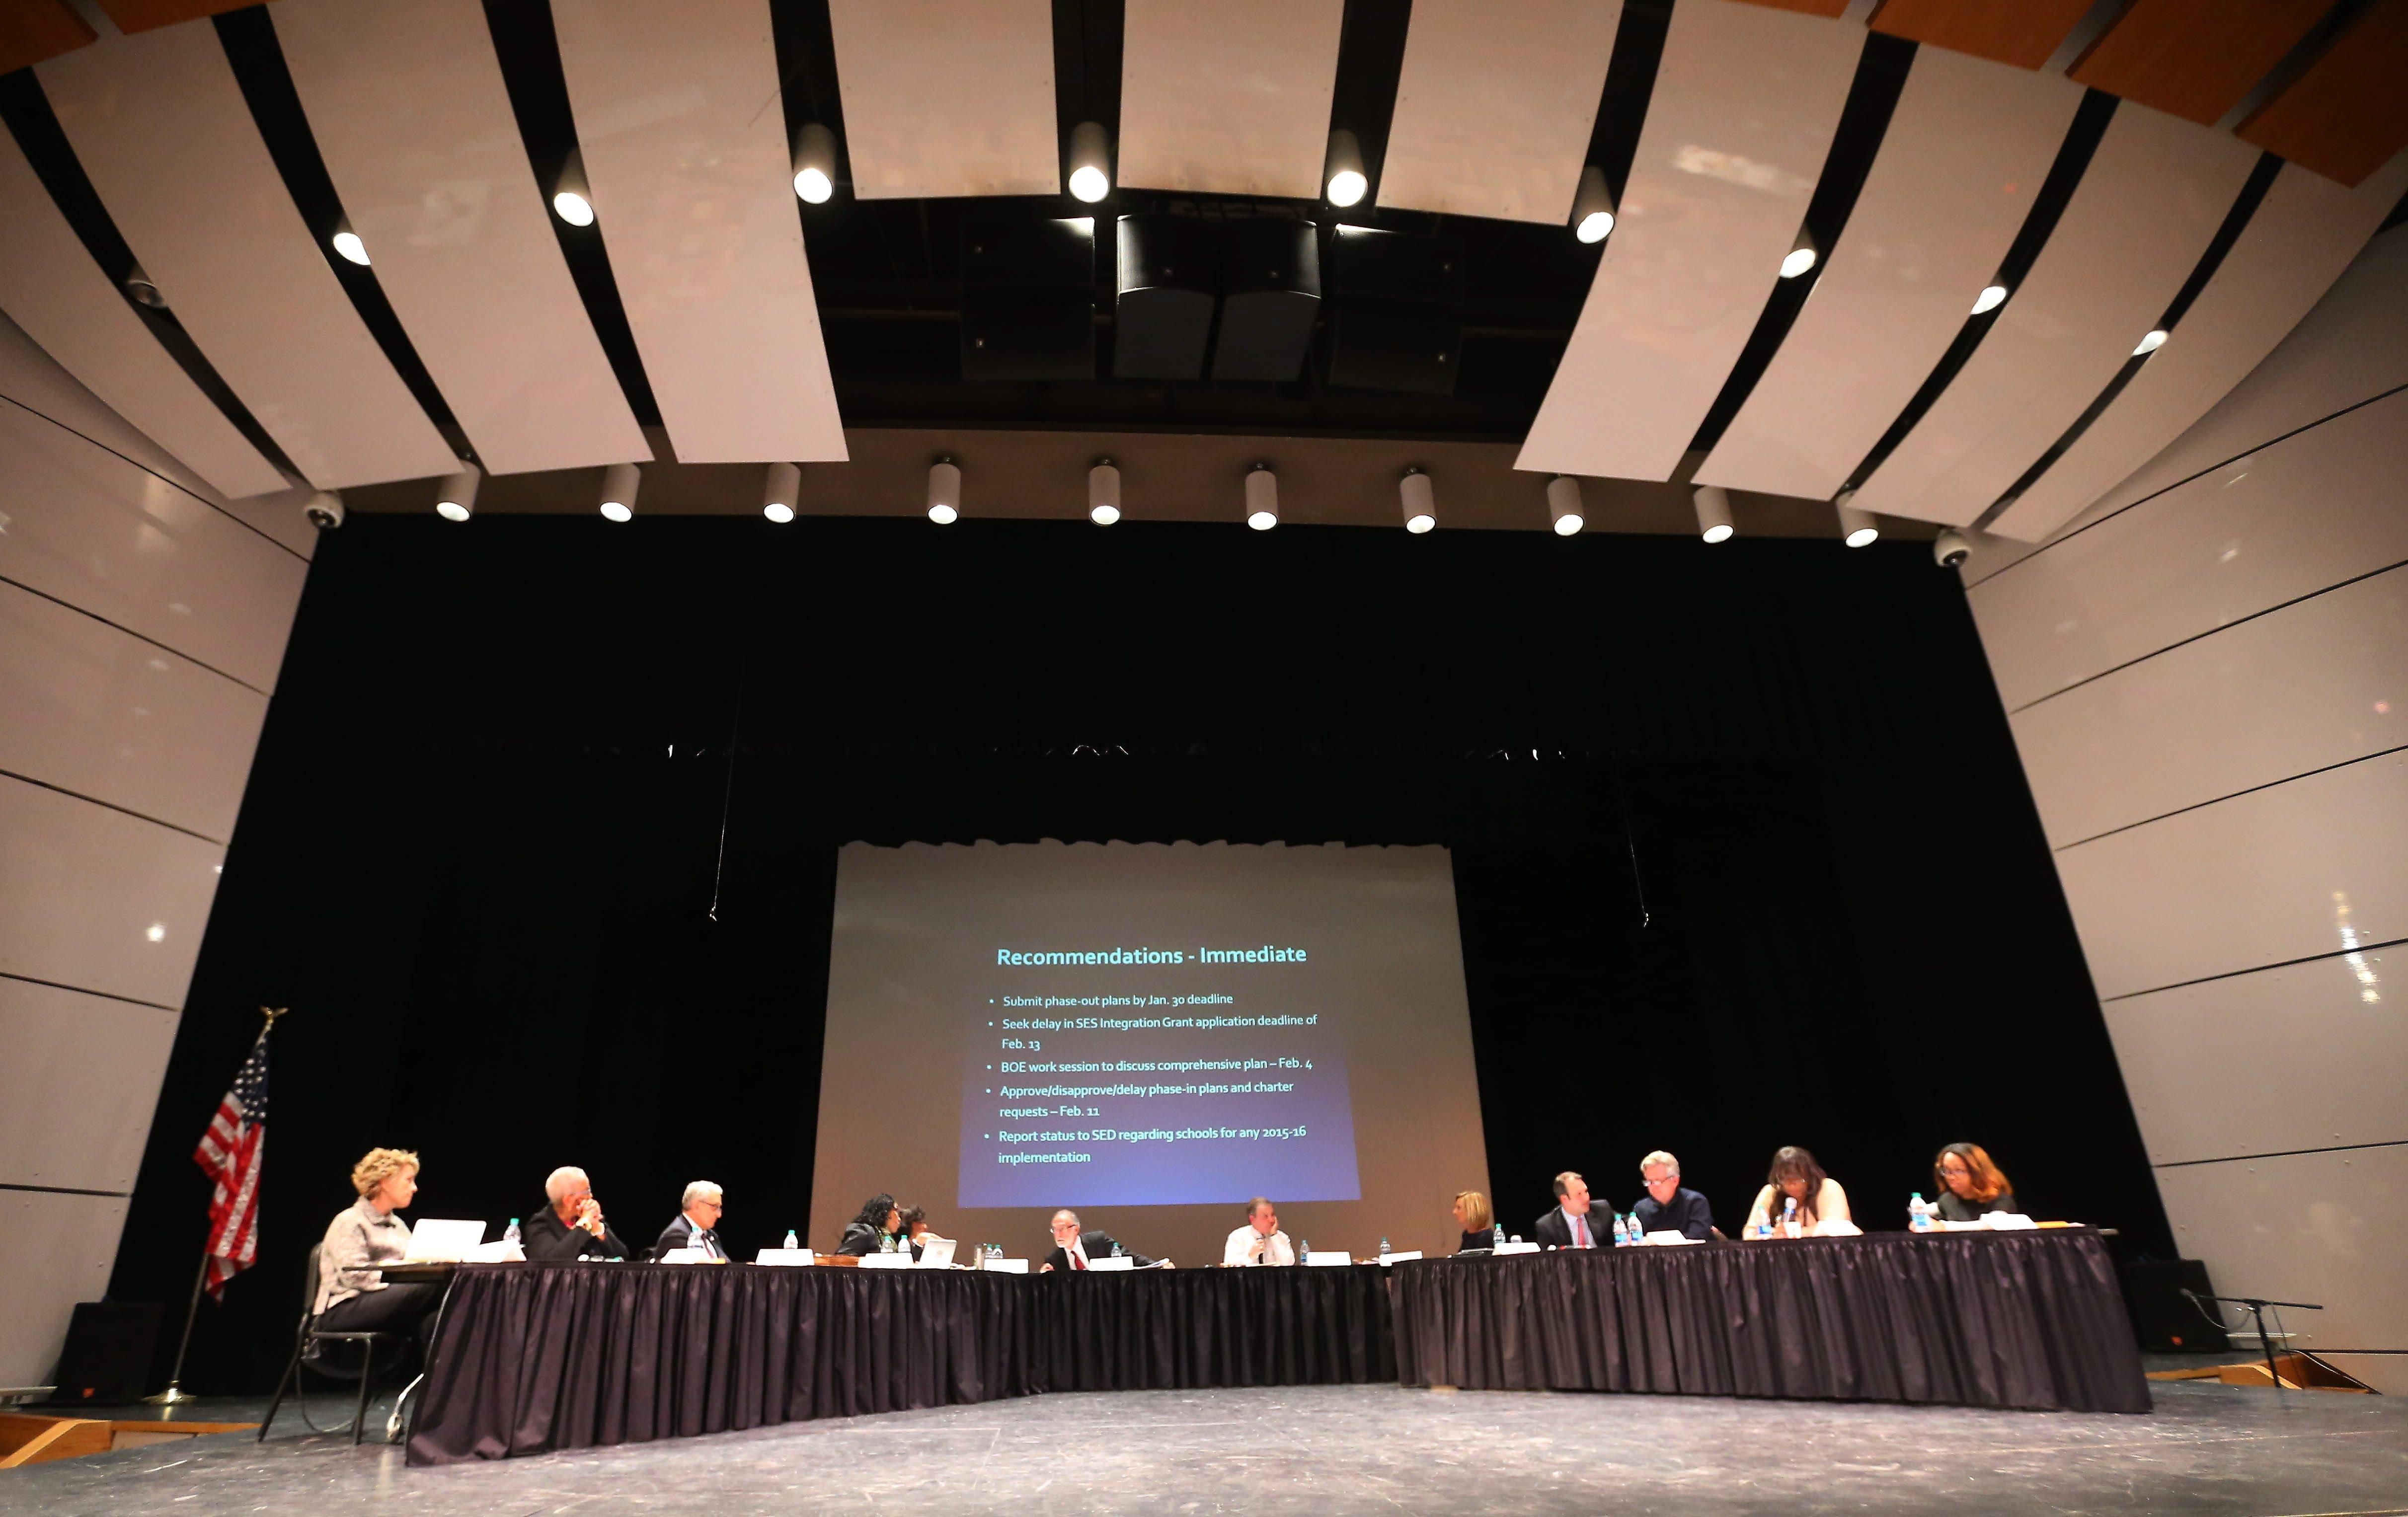 Buffalo School Board members meet at the Buffalo Academy for Visual and Performing Arts in Buffalo on Jan. 28.  (Mark Mulville/News file photo)